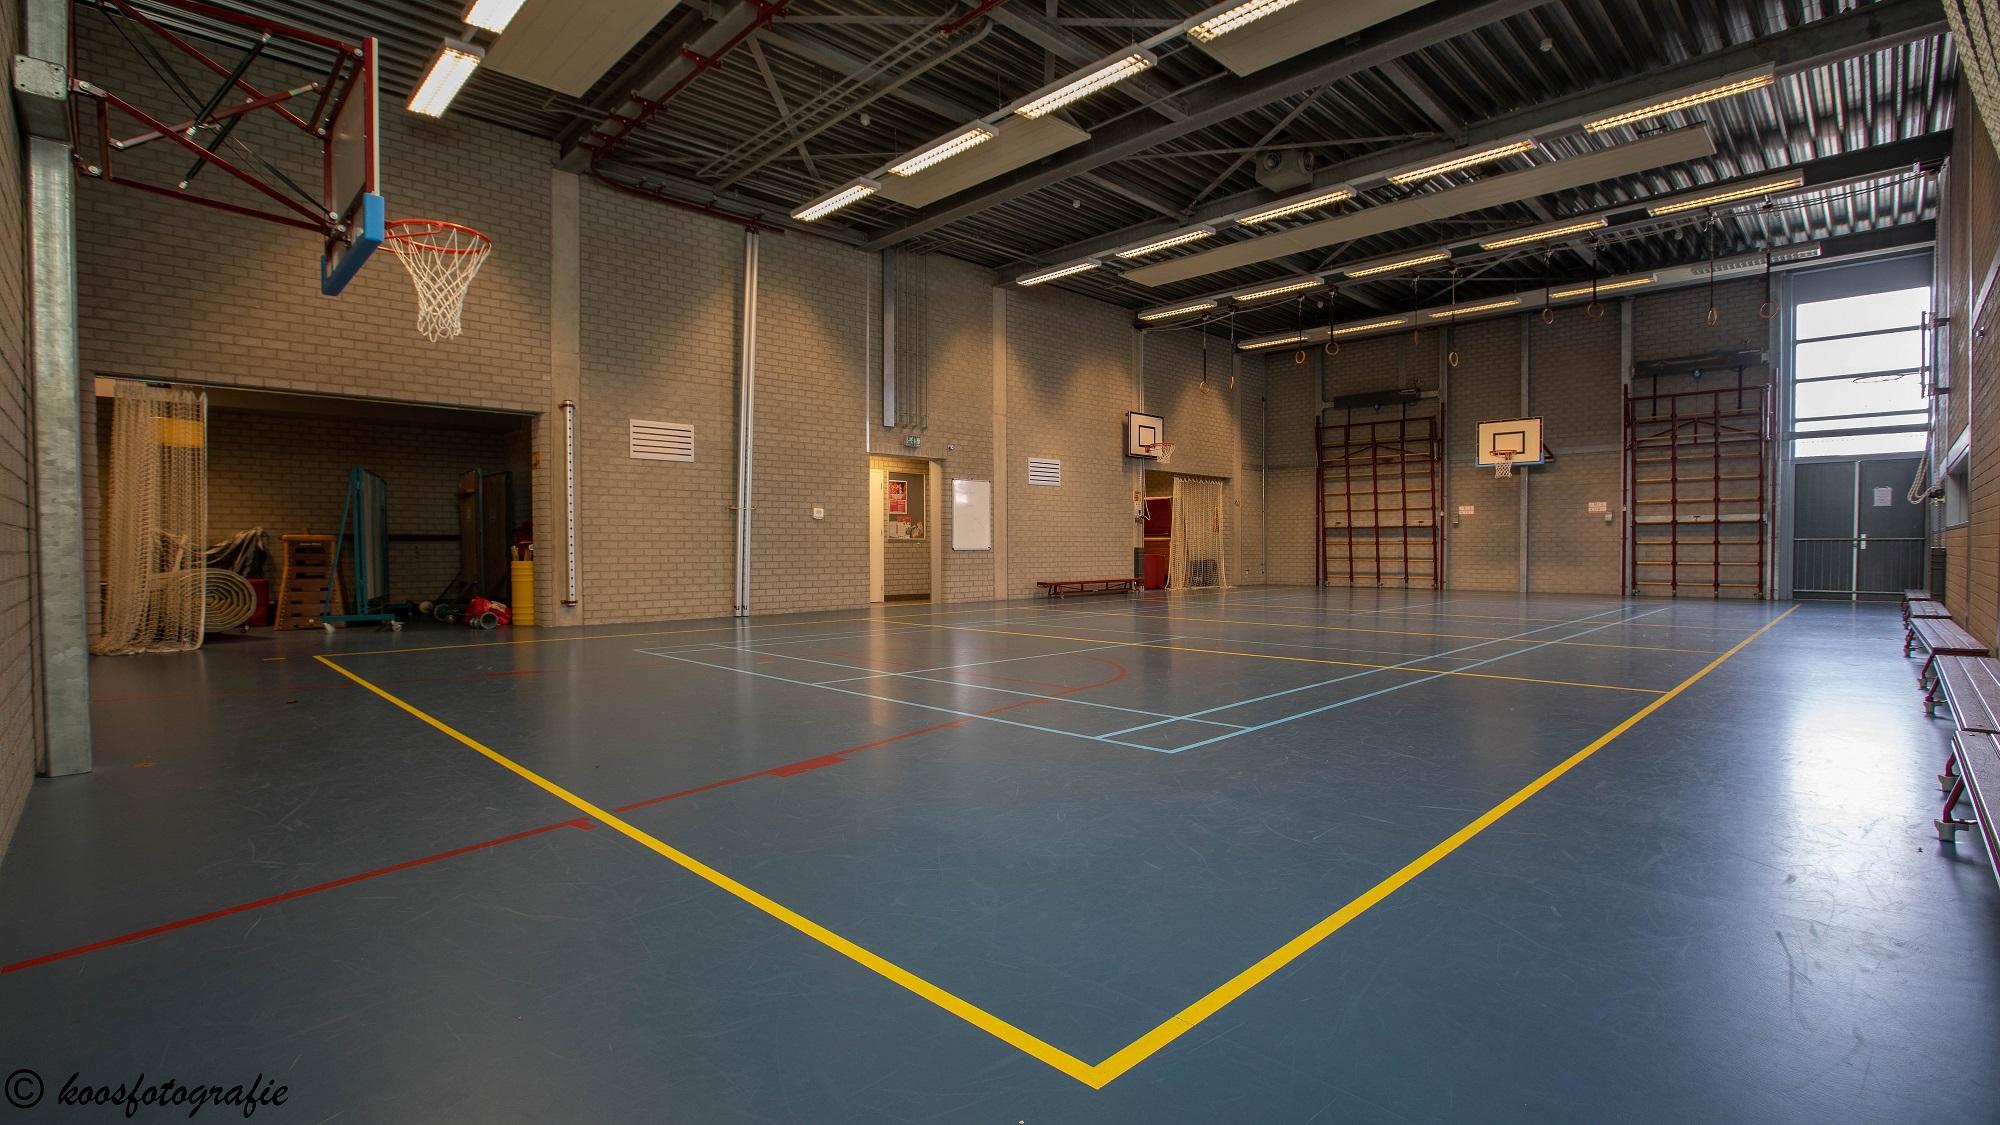 Gymzaal De Rietpluim